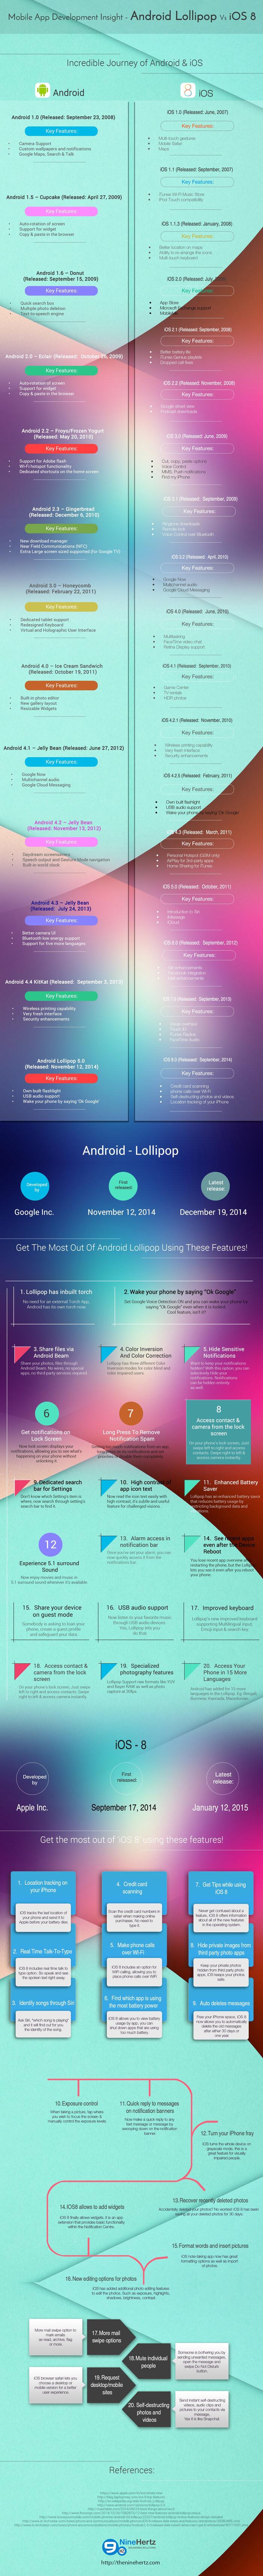 Android Lollipop vs iOS 8